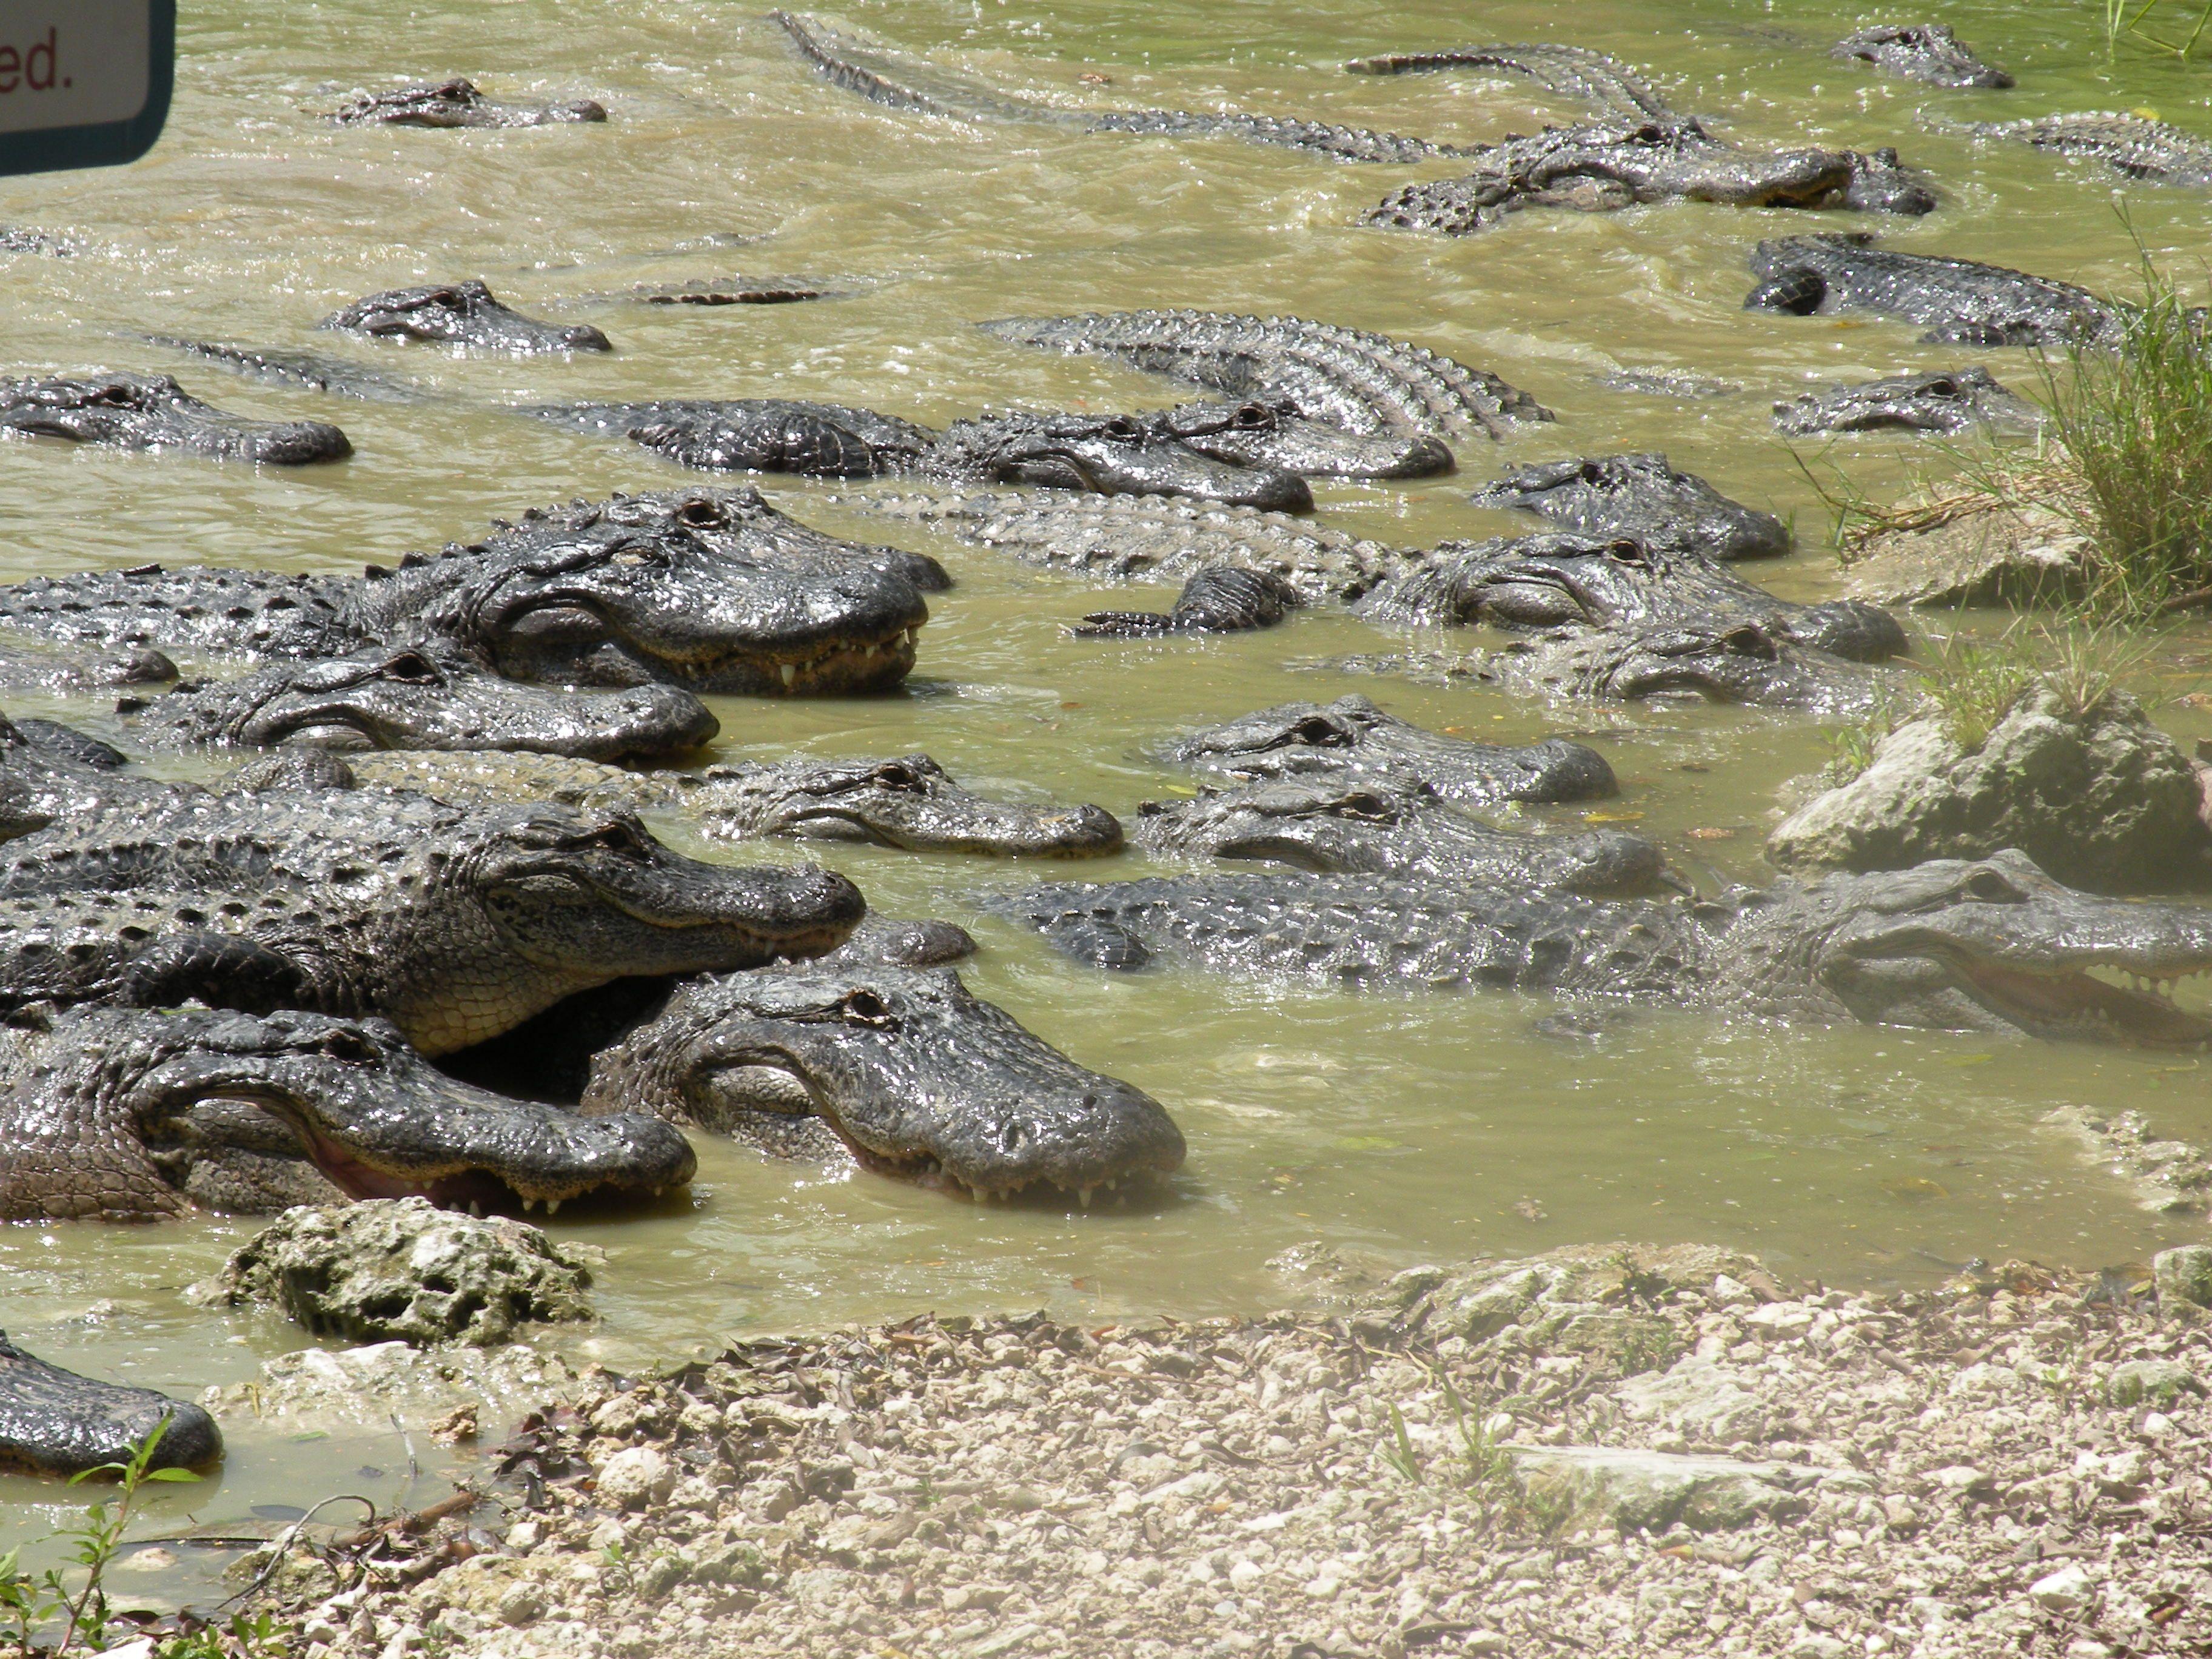 Gators in the Everglades.